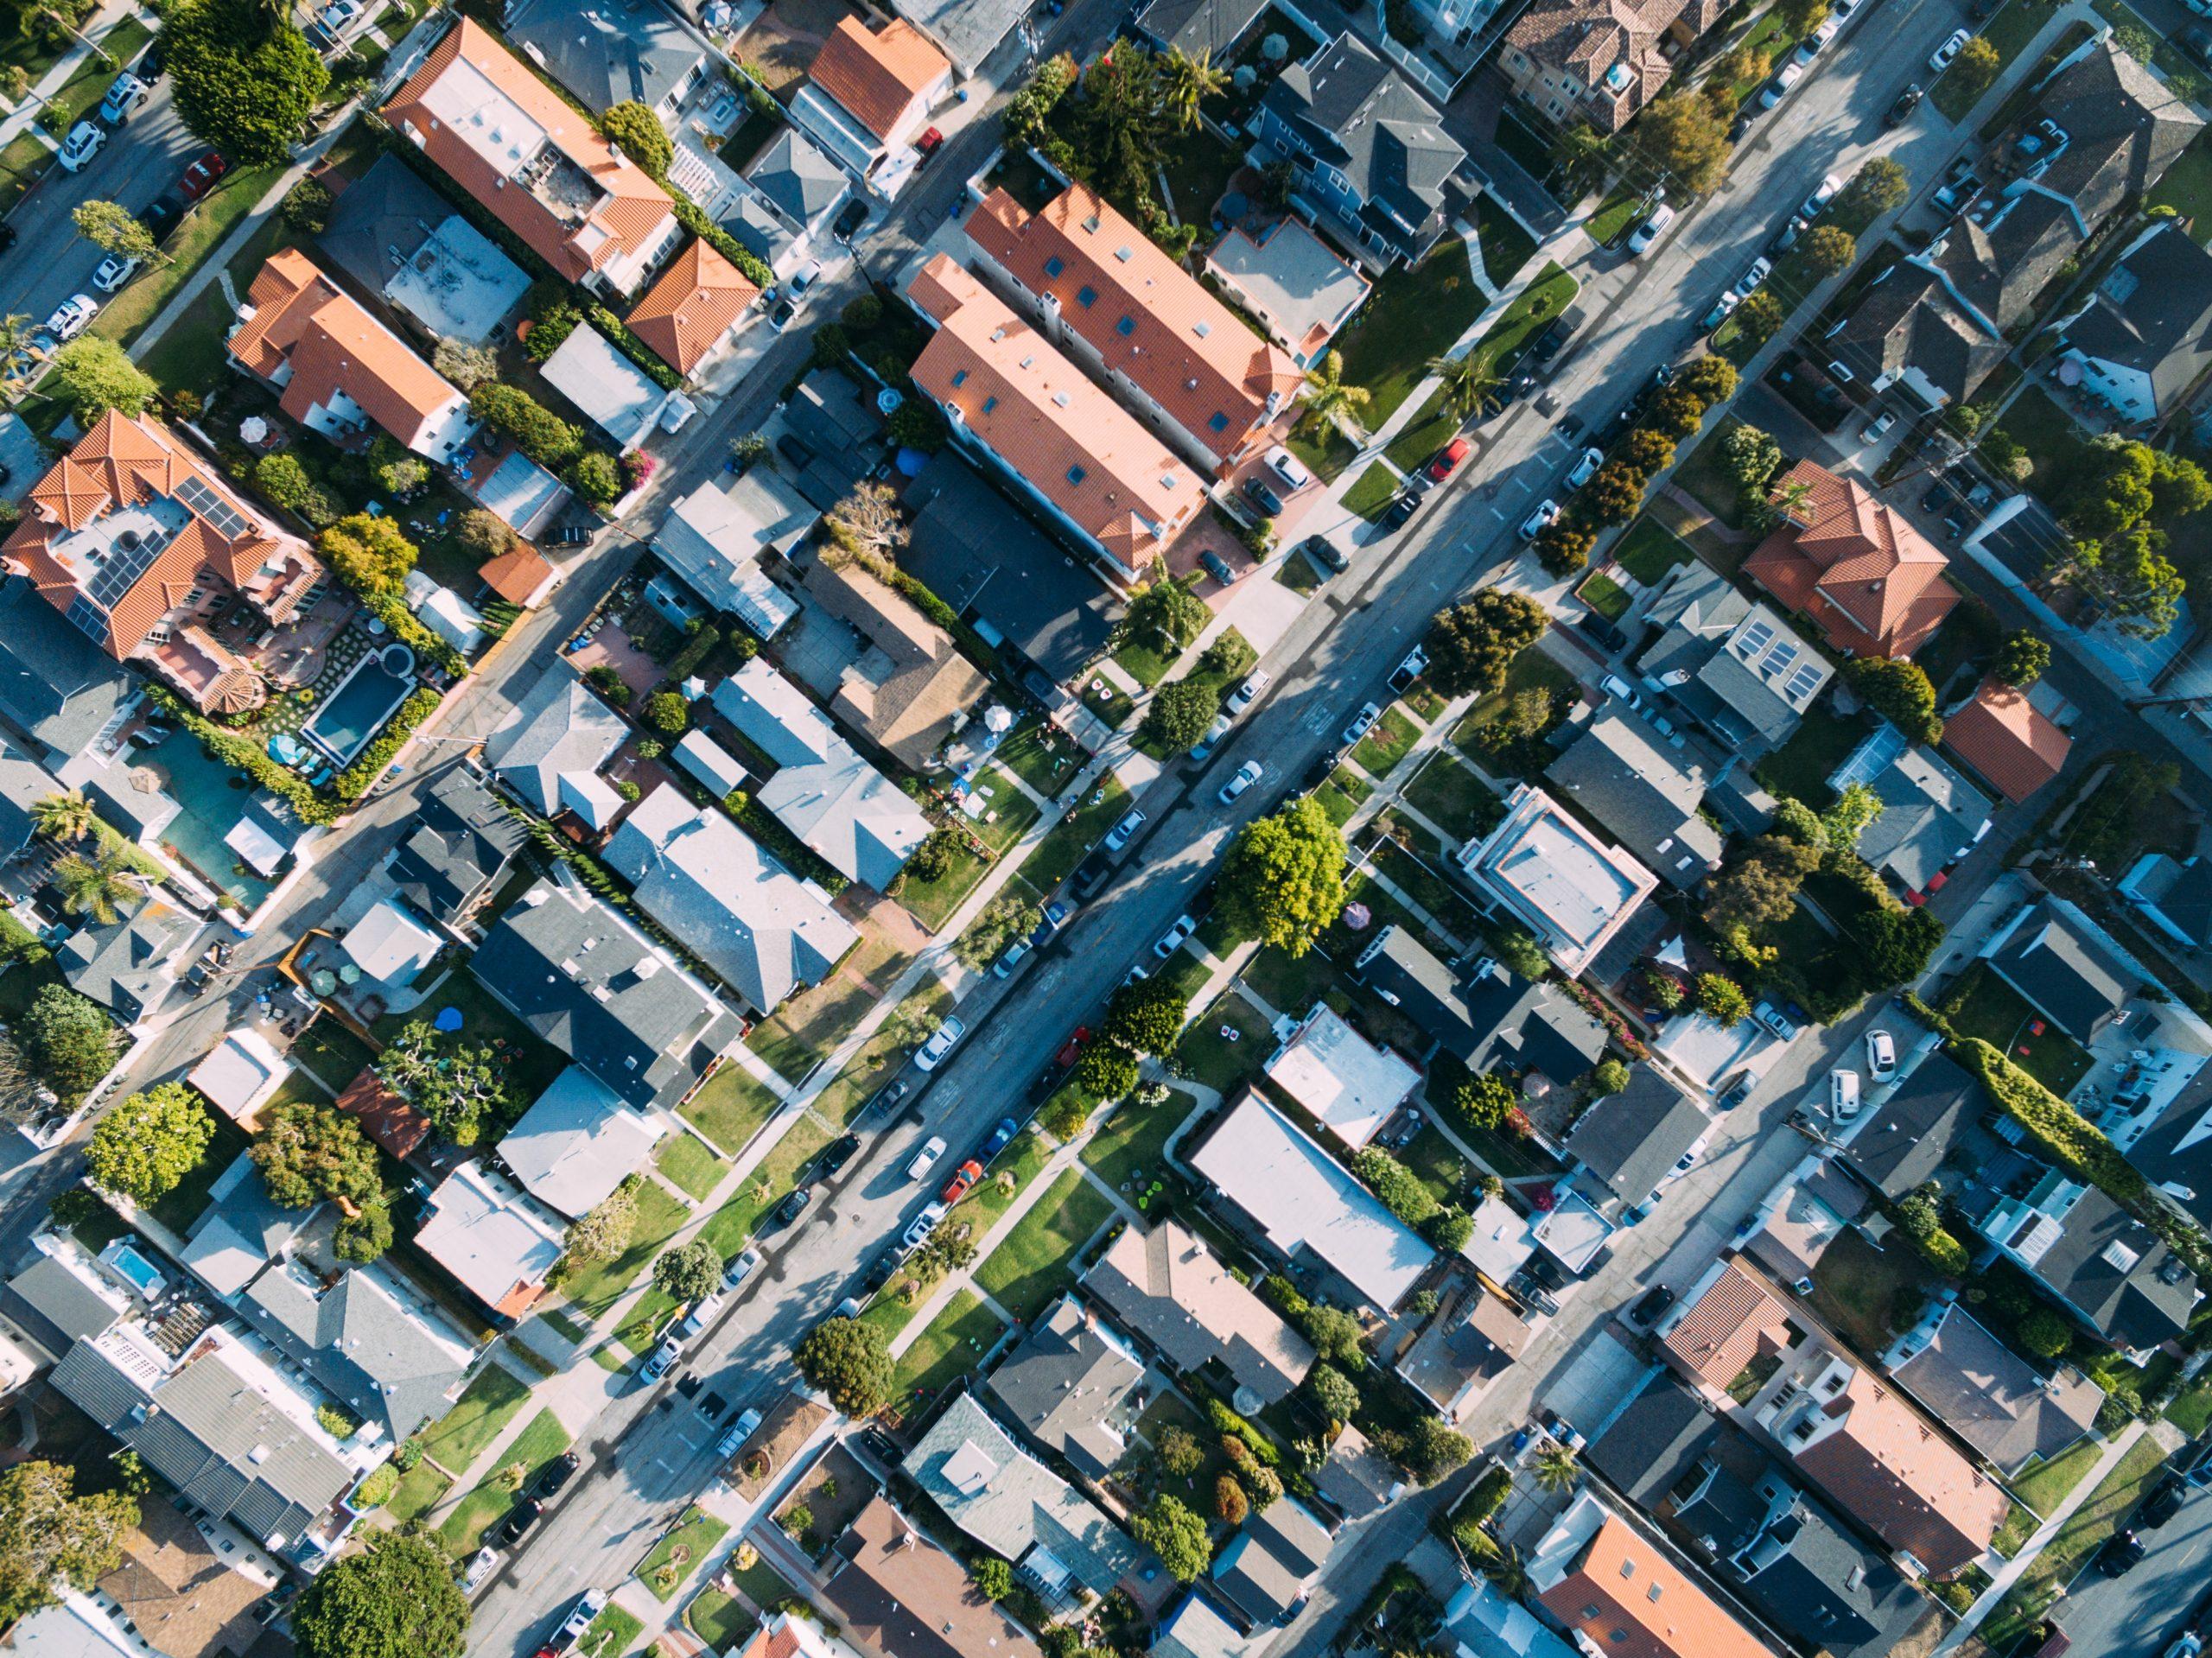 Homeward bound: UK housing market post -COVID-19